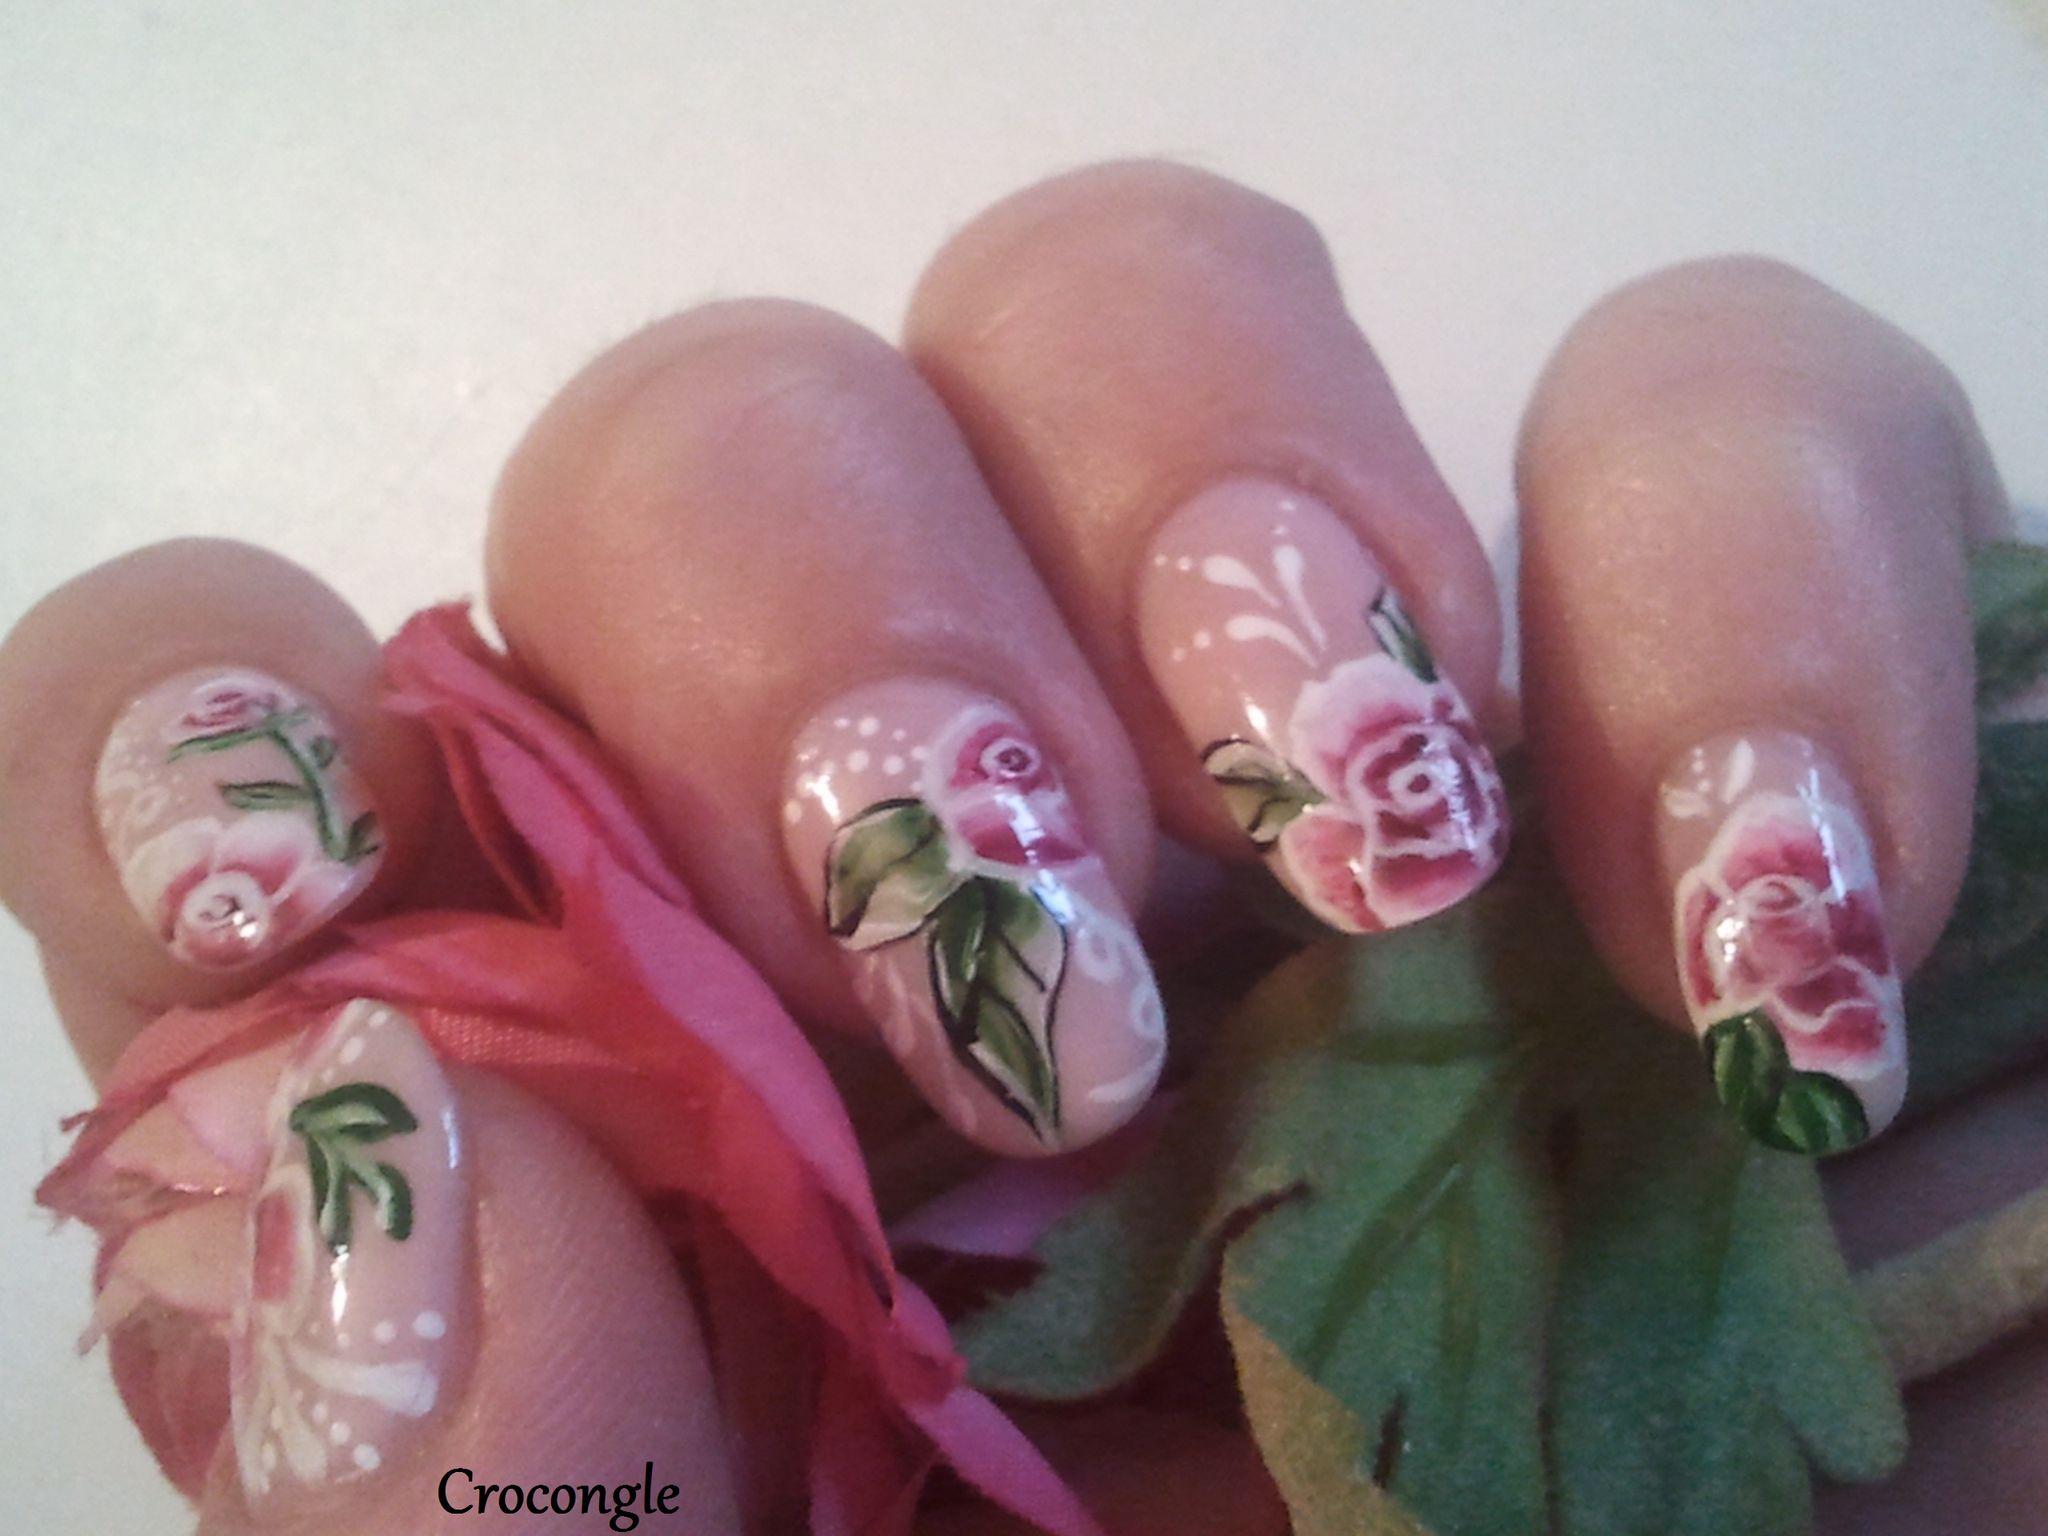 Nail art Jolies roses romantiques vernis China Glaze Innocence Crocongle